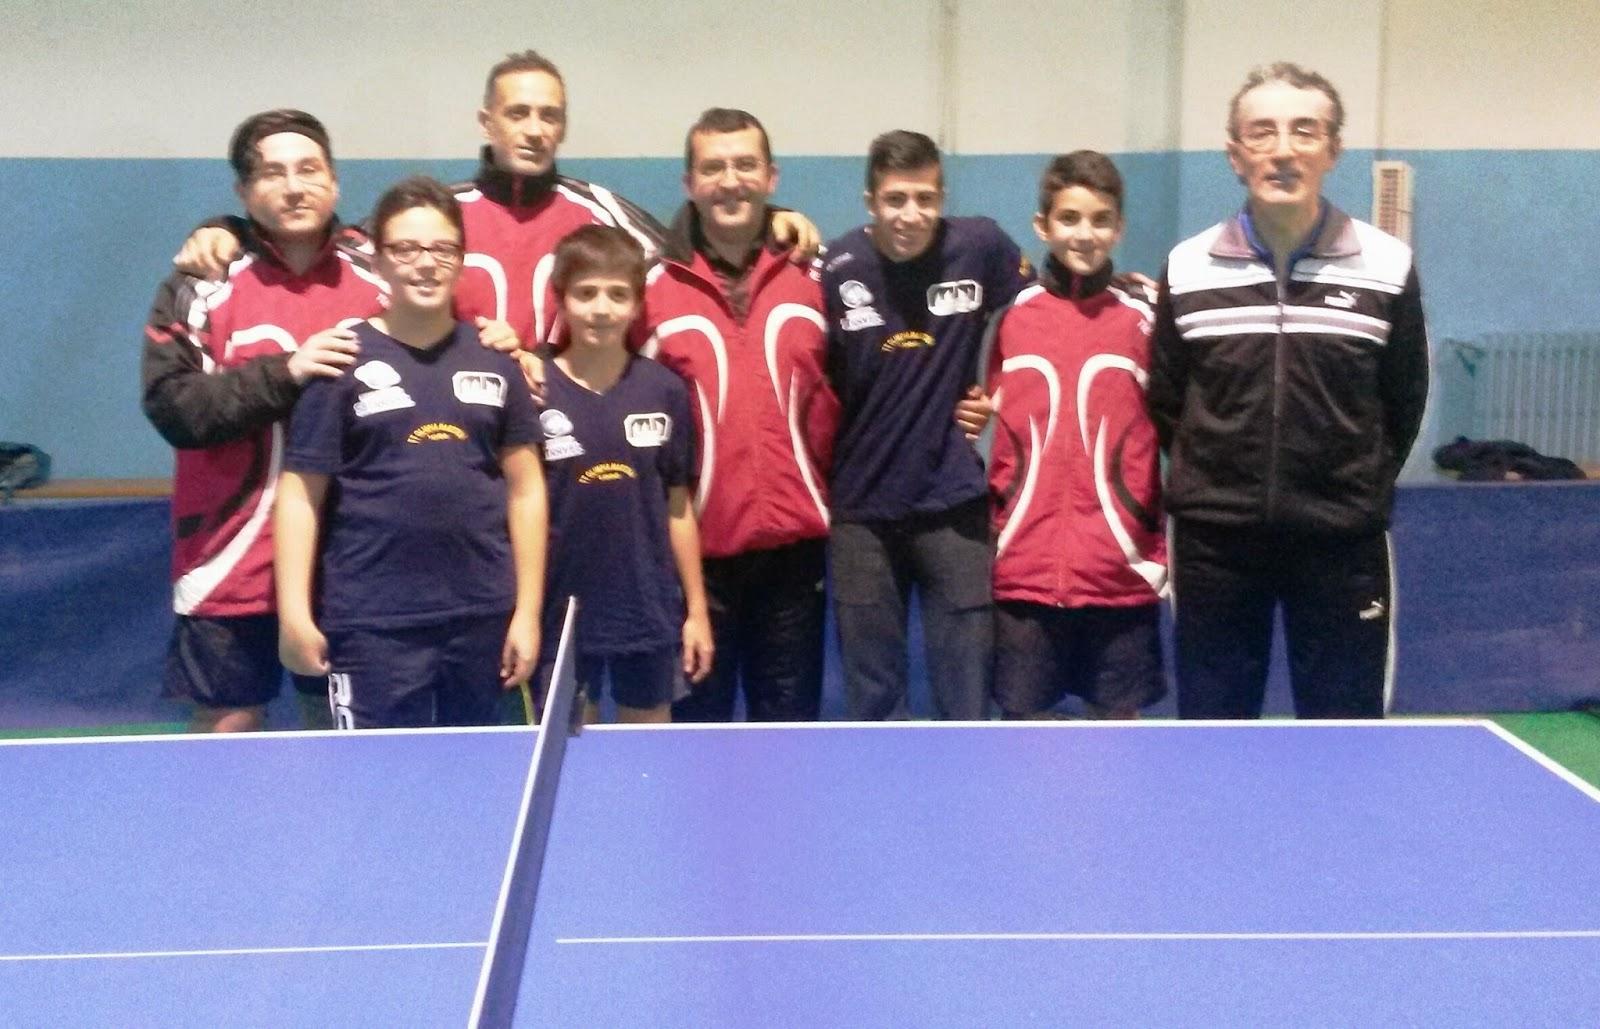 Serie c2 - Stefano bosi tennis tavolo ...